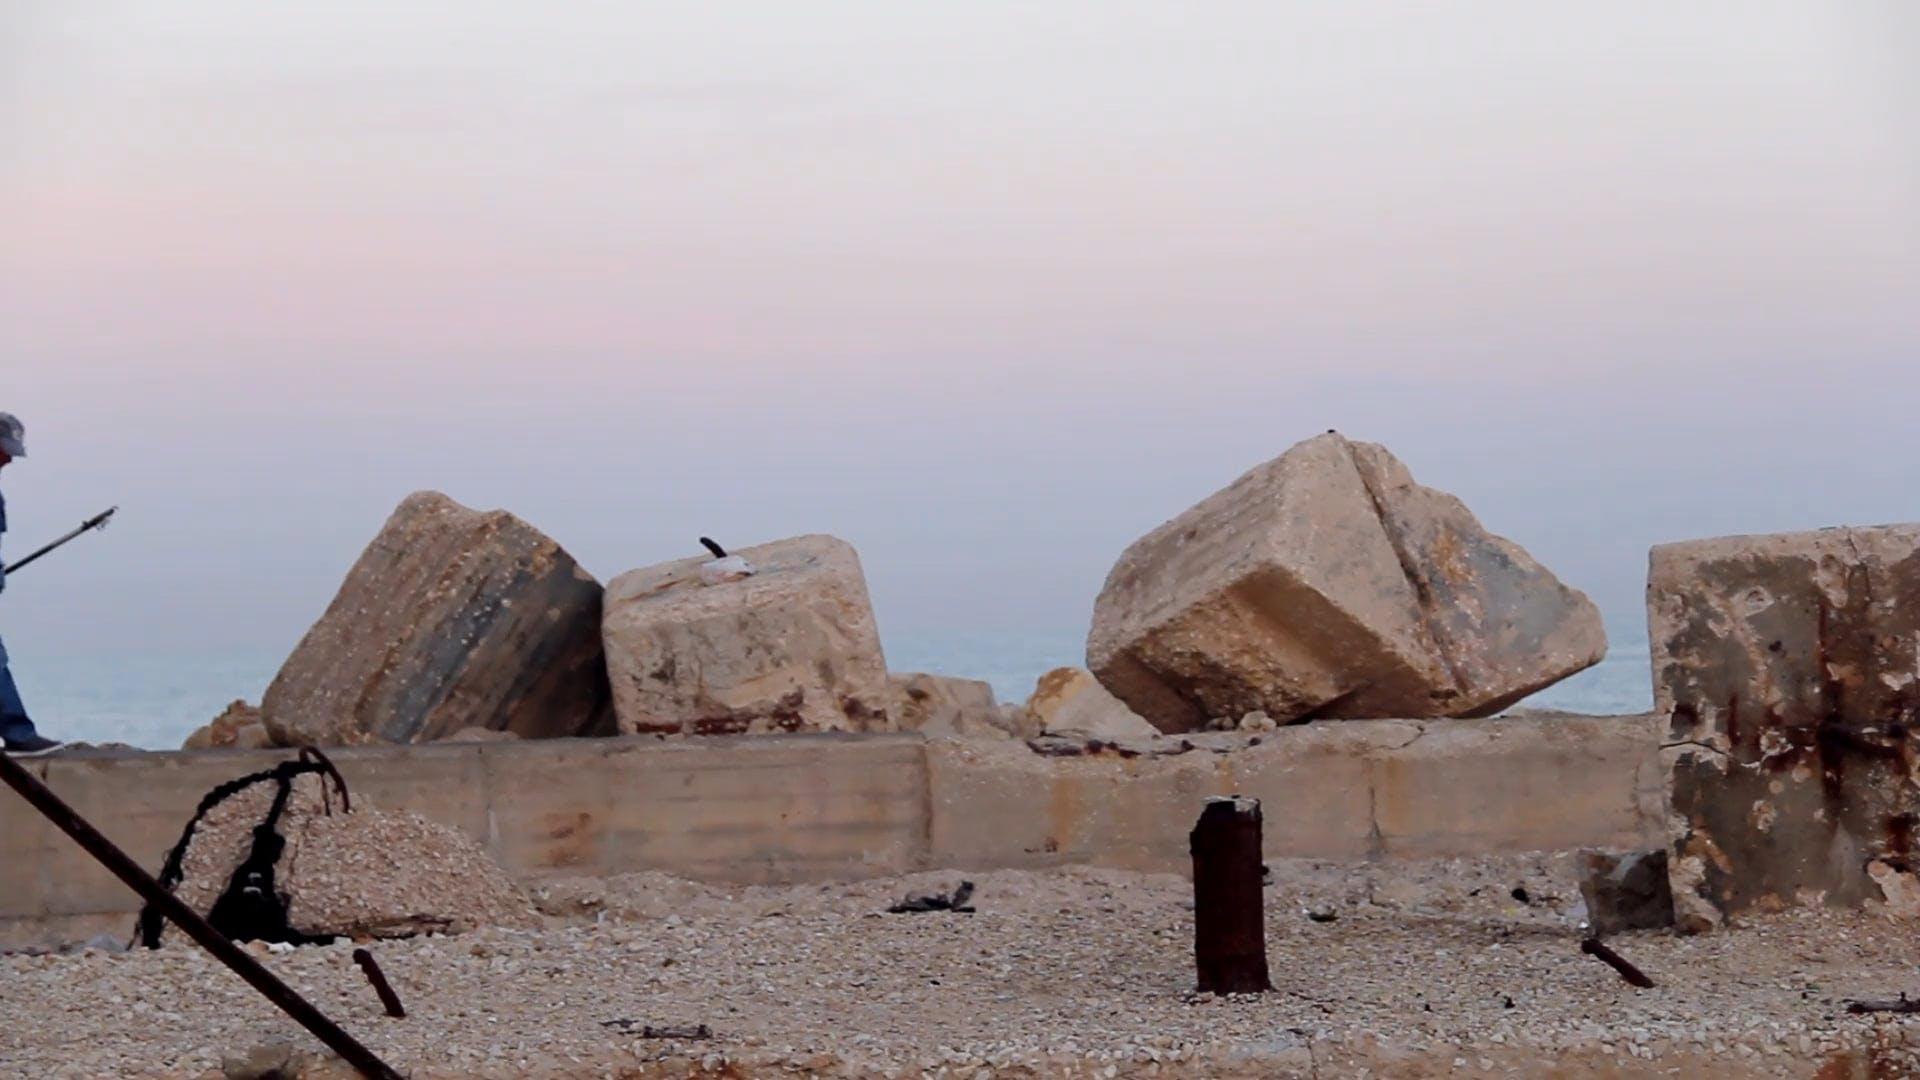 sand rocks person walking boulders man fishing rod fisherman bay